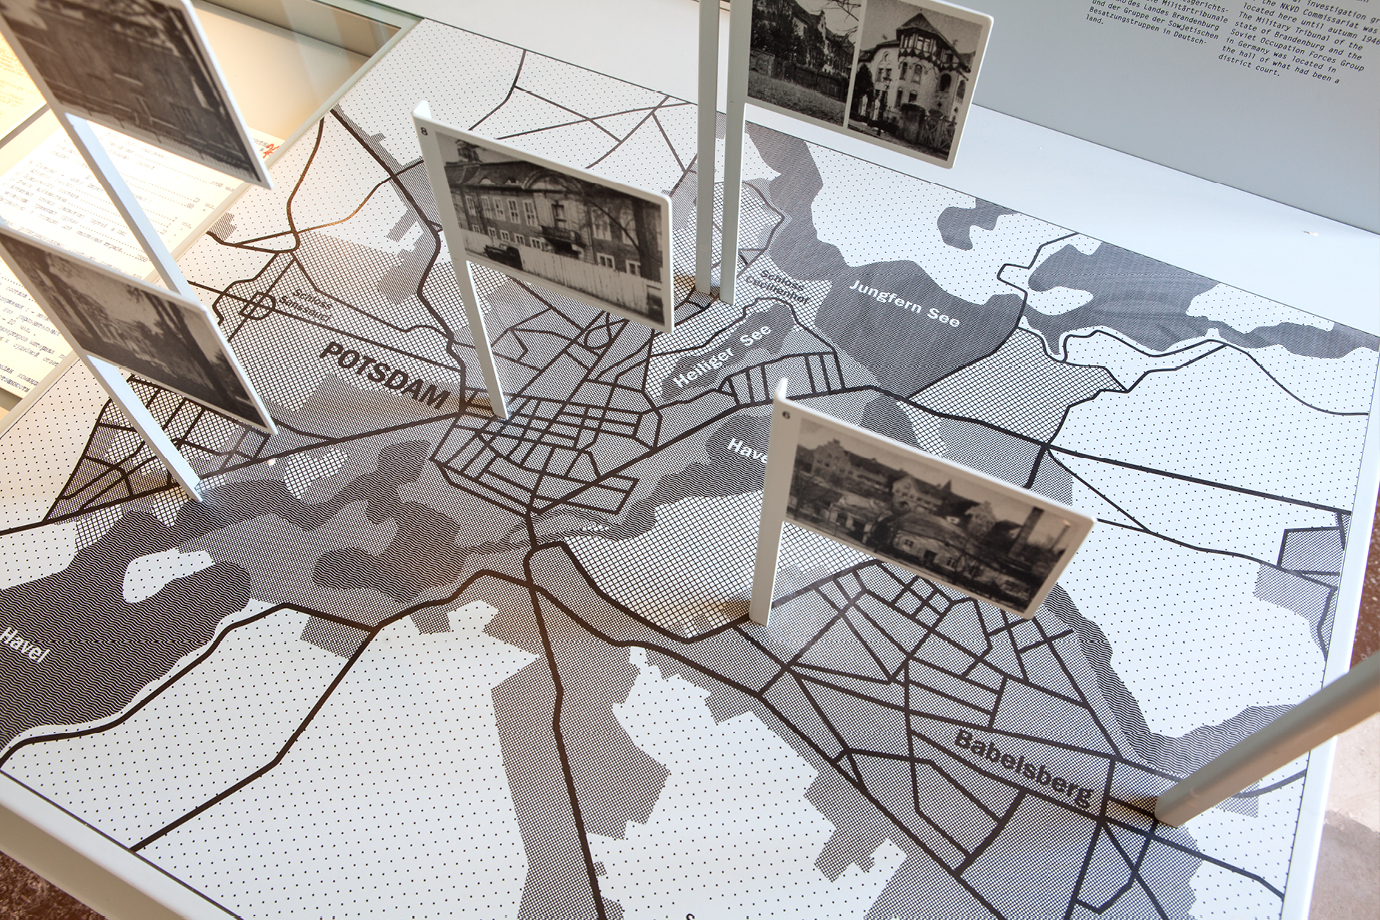 http://e-o-t.de/wordpress/wp-content/uploads/2017/04/2012_eot-Leistikow-Exhibition-6.jpg